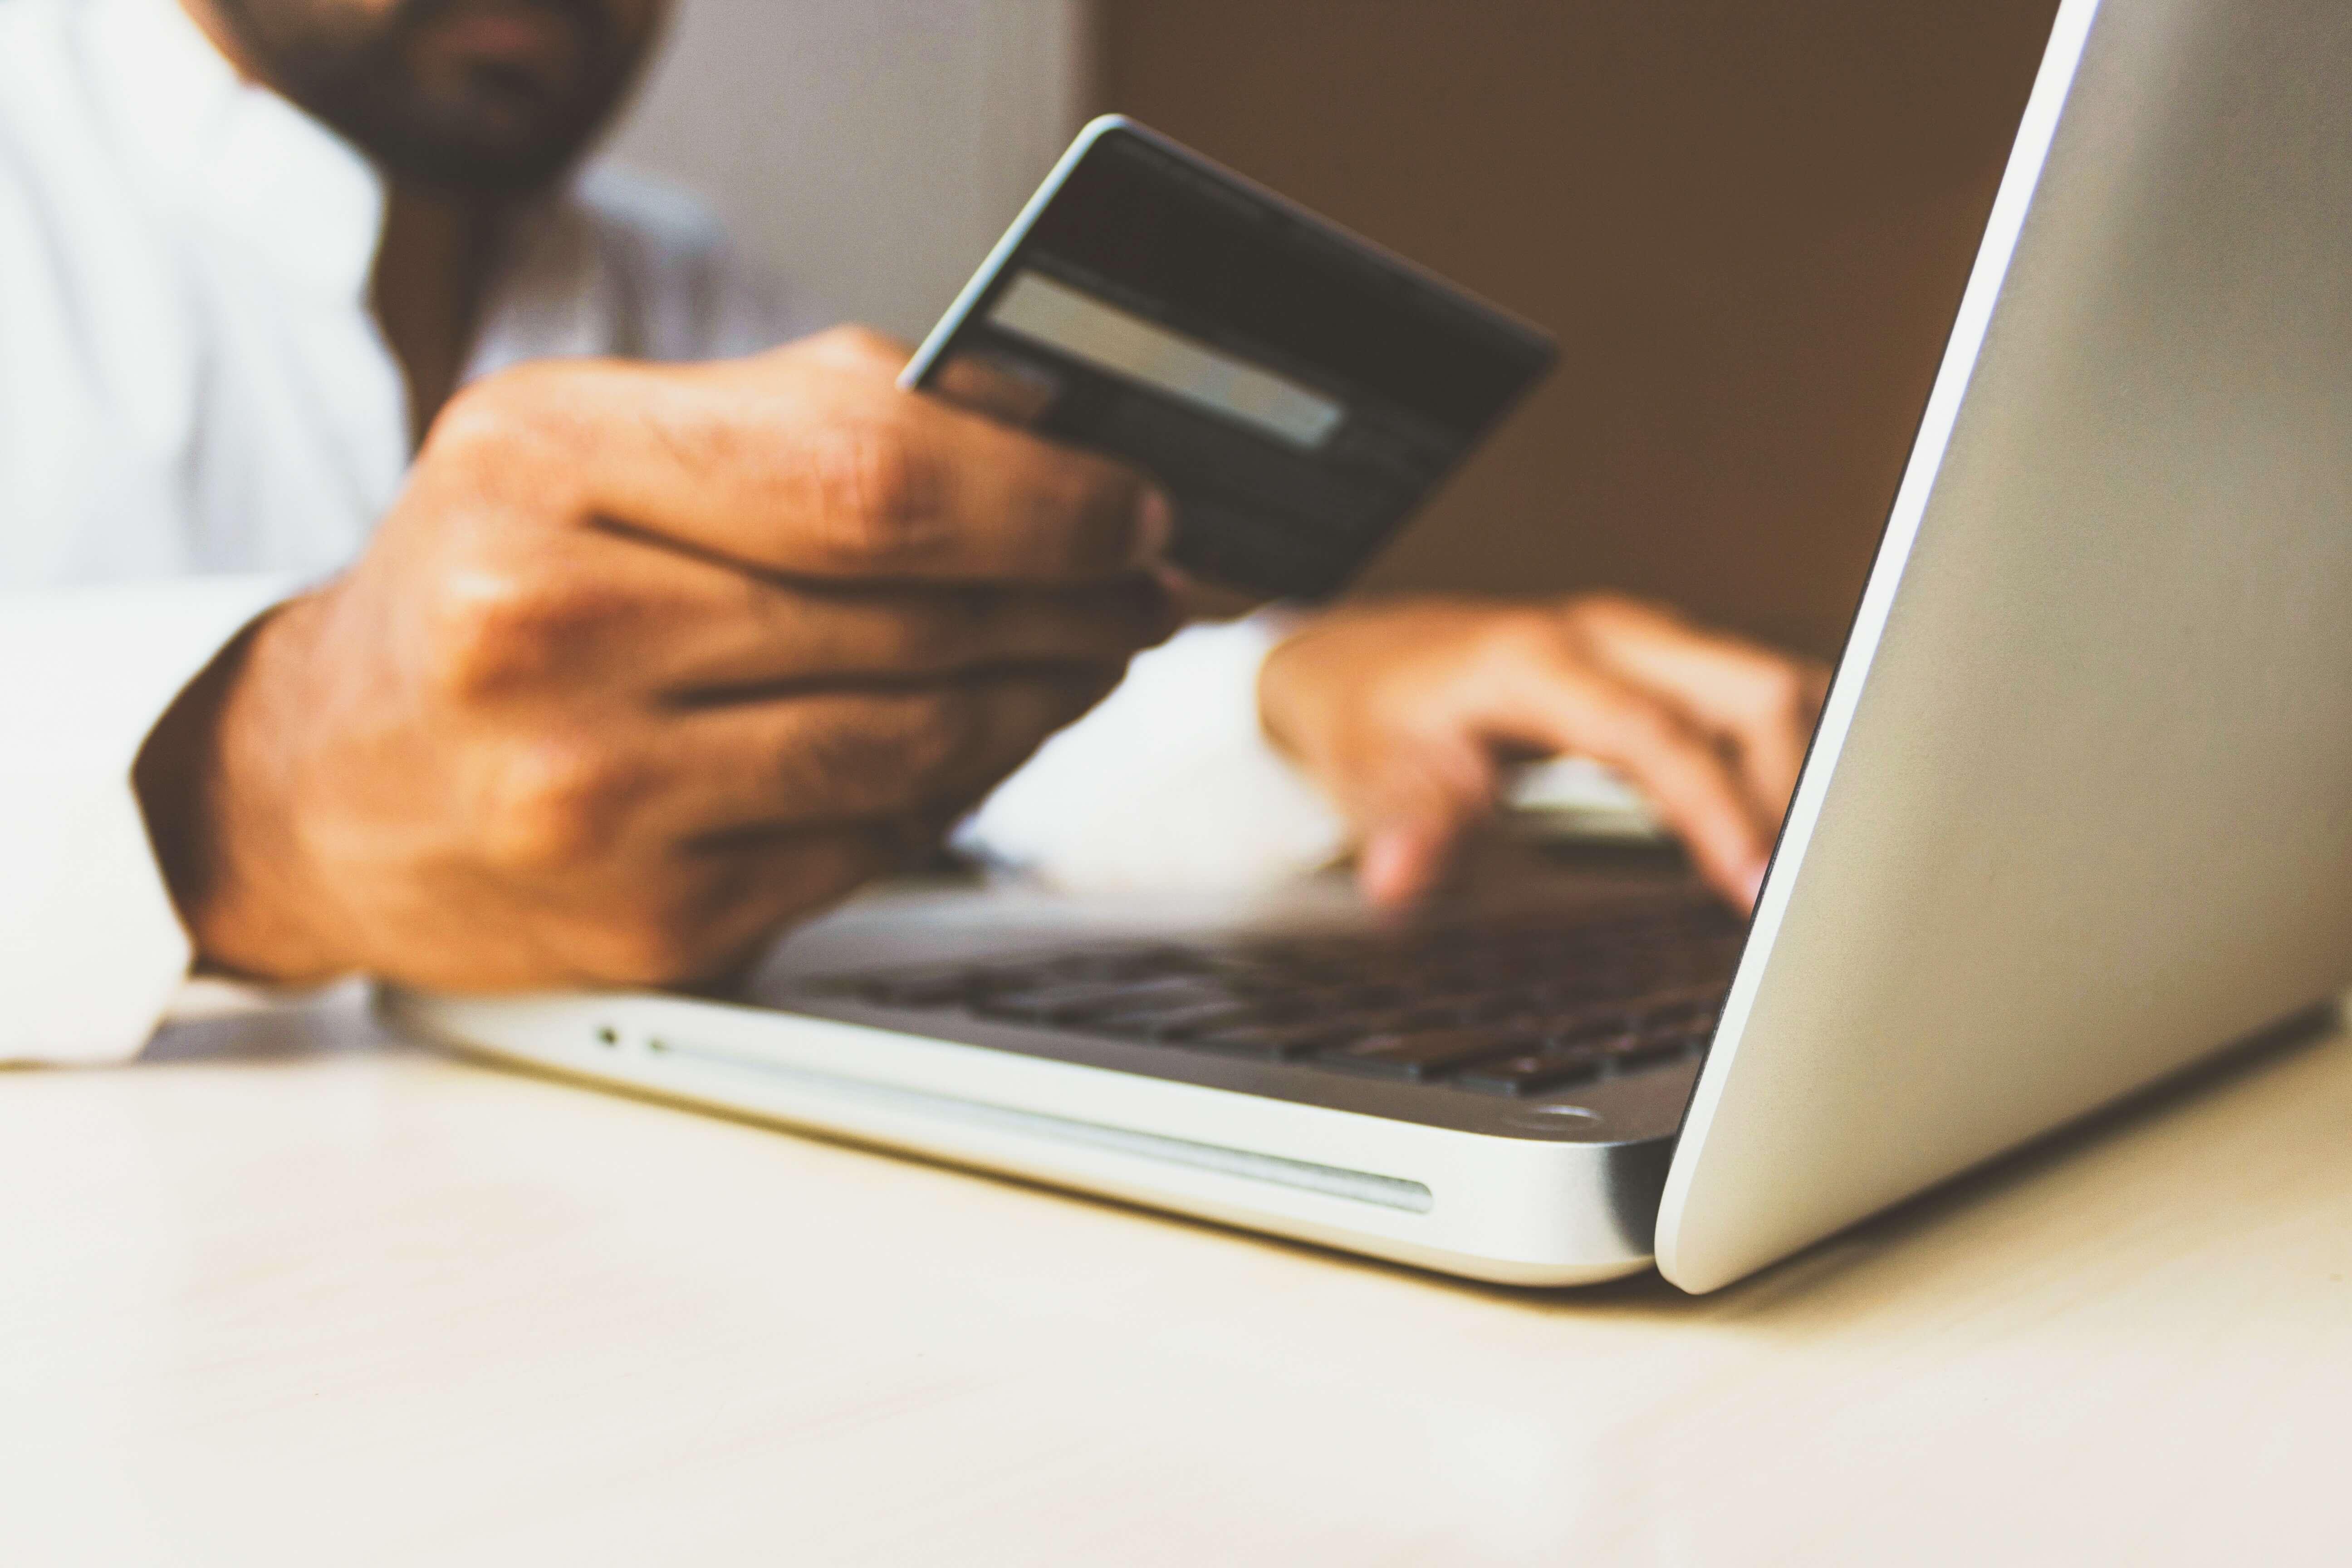 How to cancel direct debit